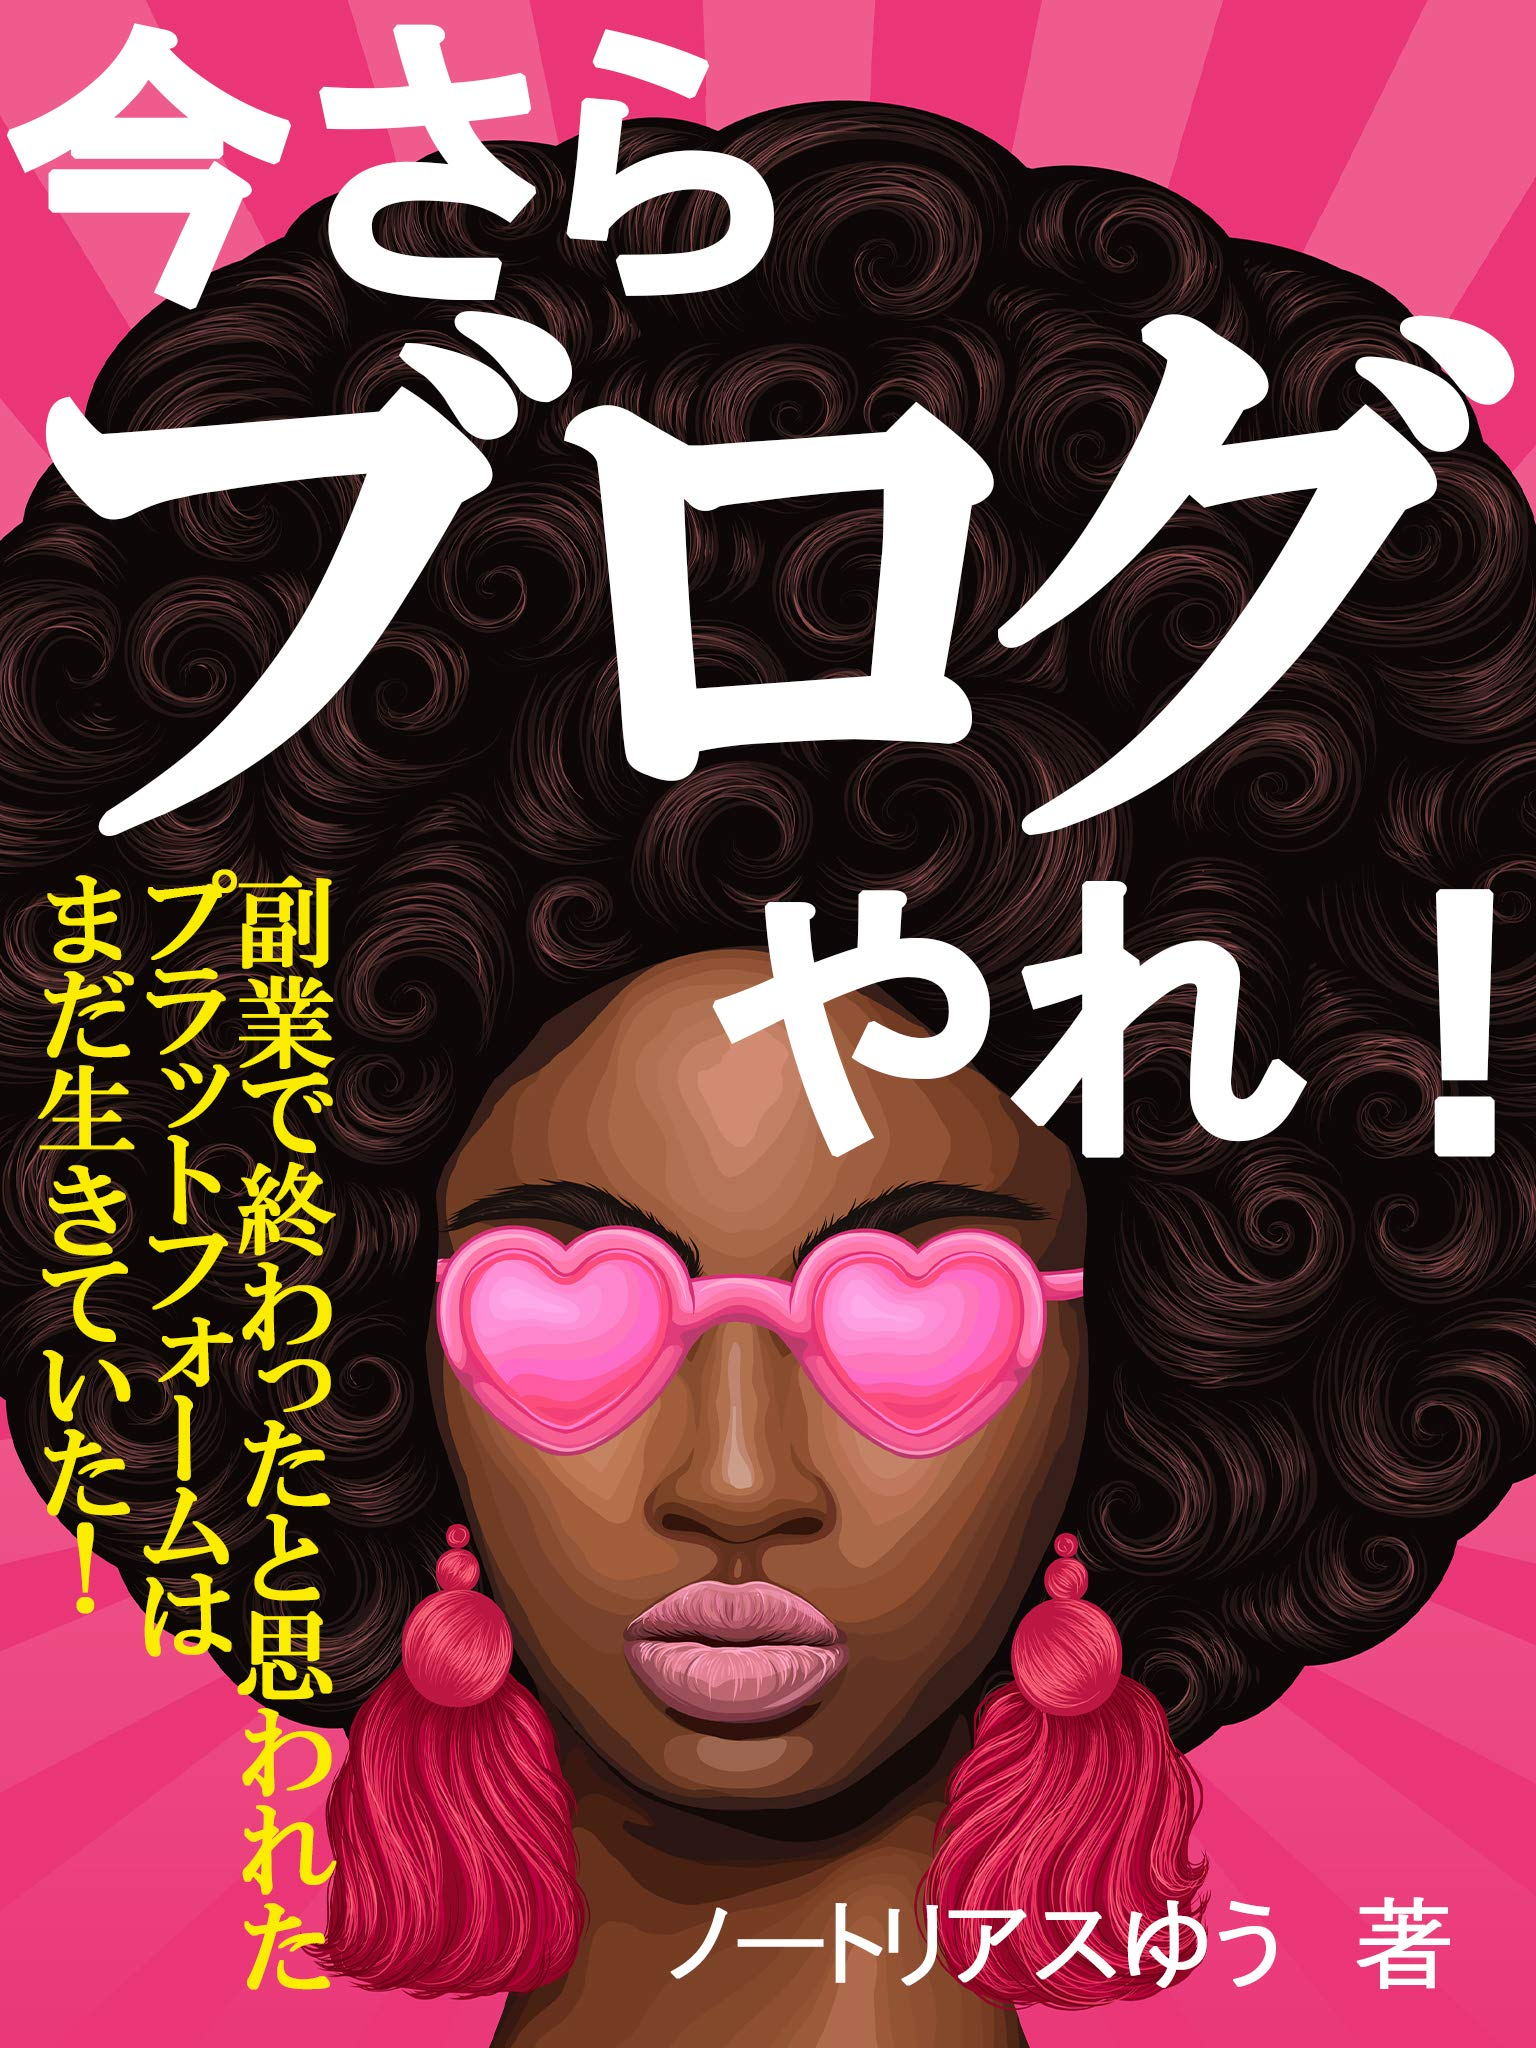 imasarablogyarefukugyousyoshinsyaafirieito: fukugyoudeowatatoomowaretapuratofomuhamadaikiteita (Japanese Edition)